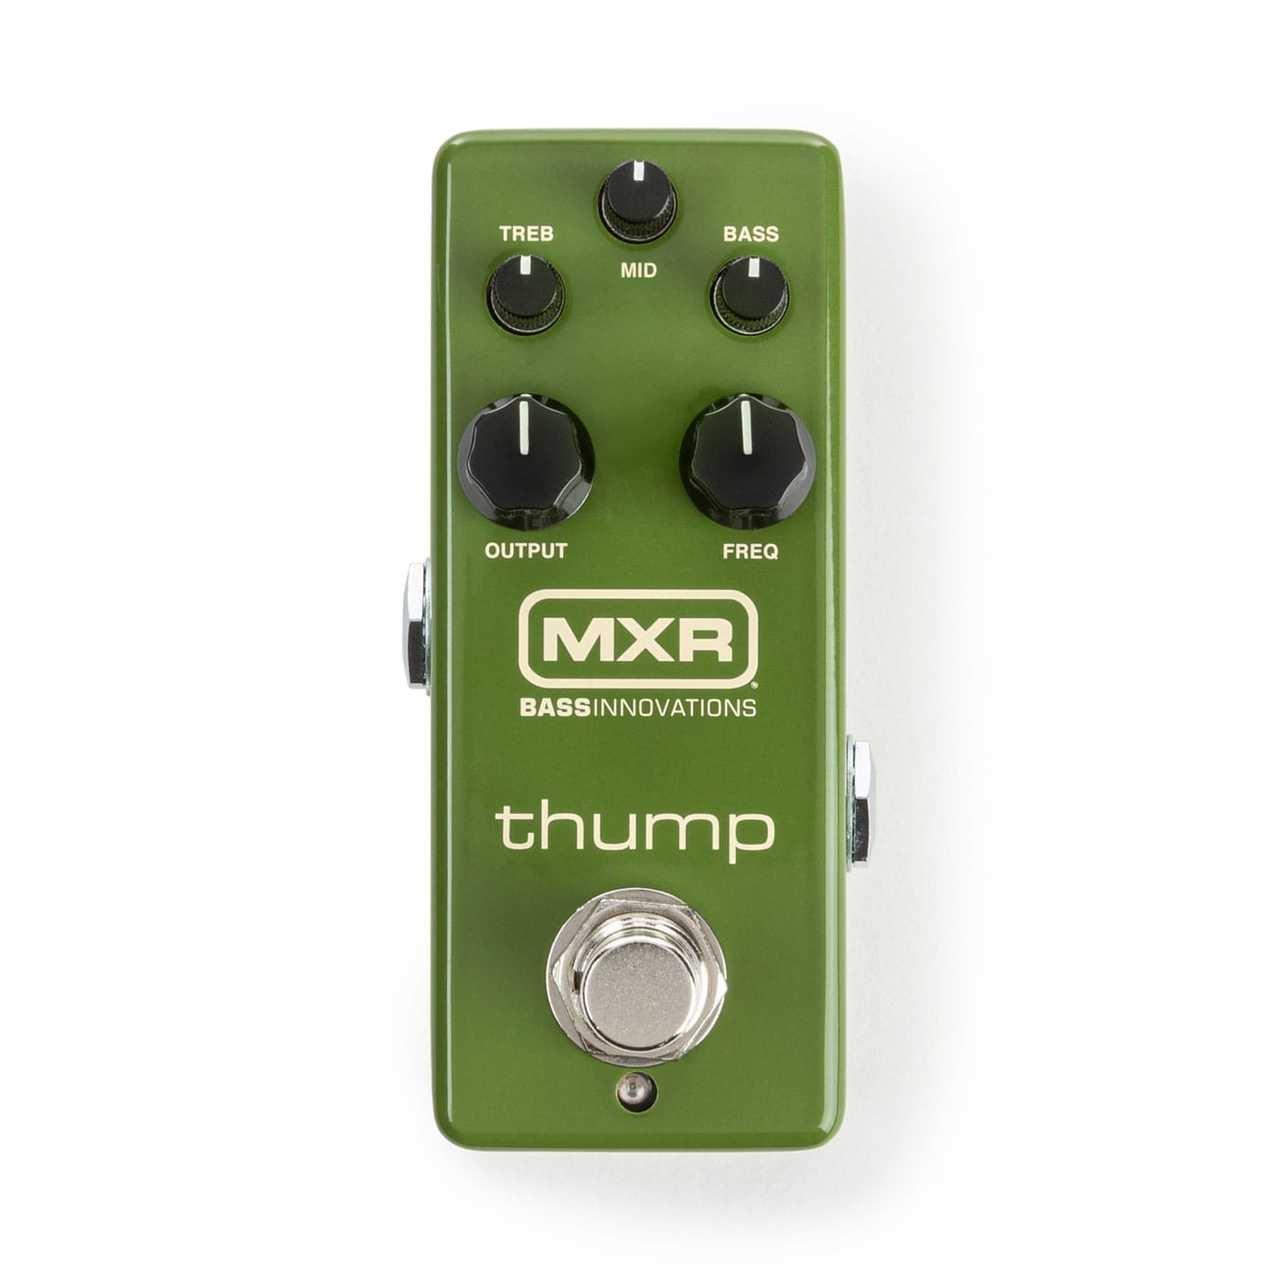 MXR M281 Thump Bass Preamp